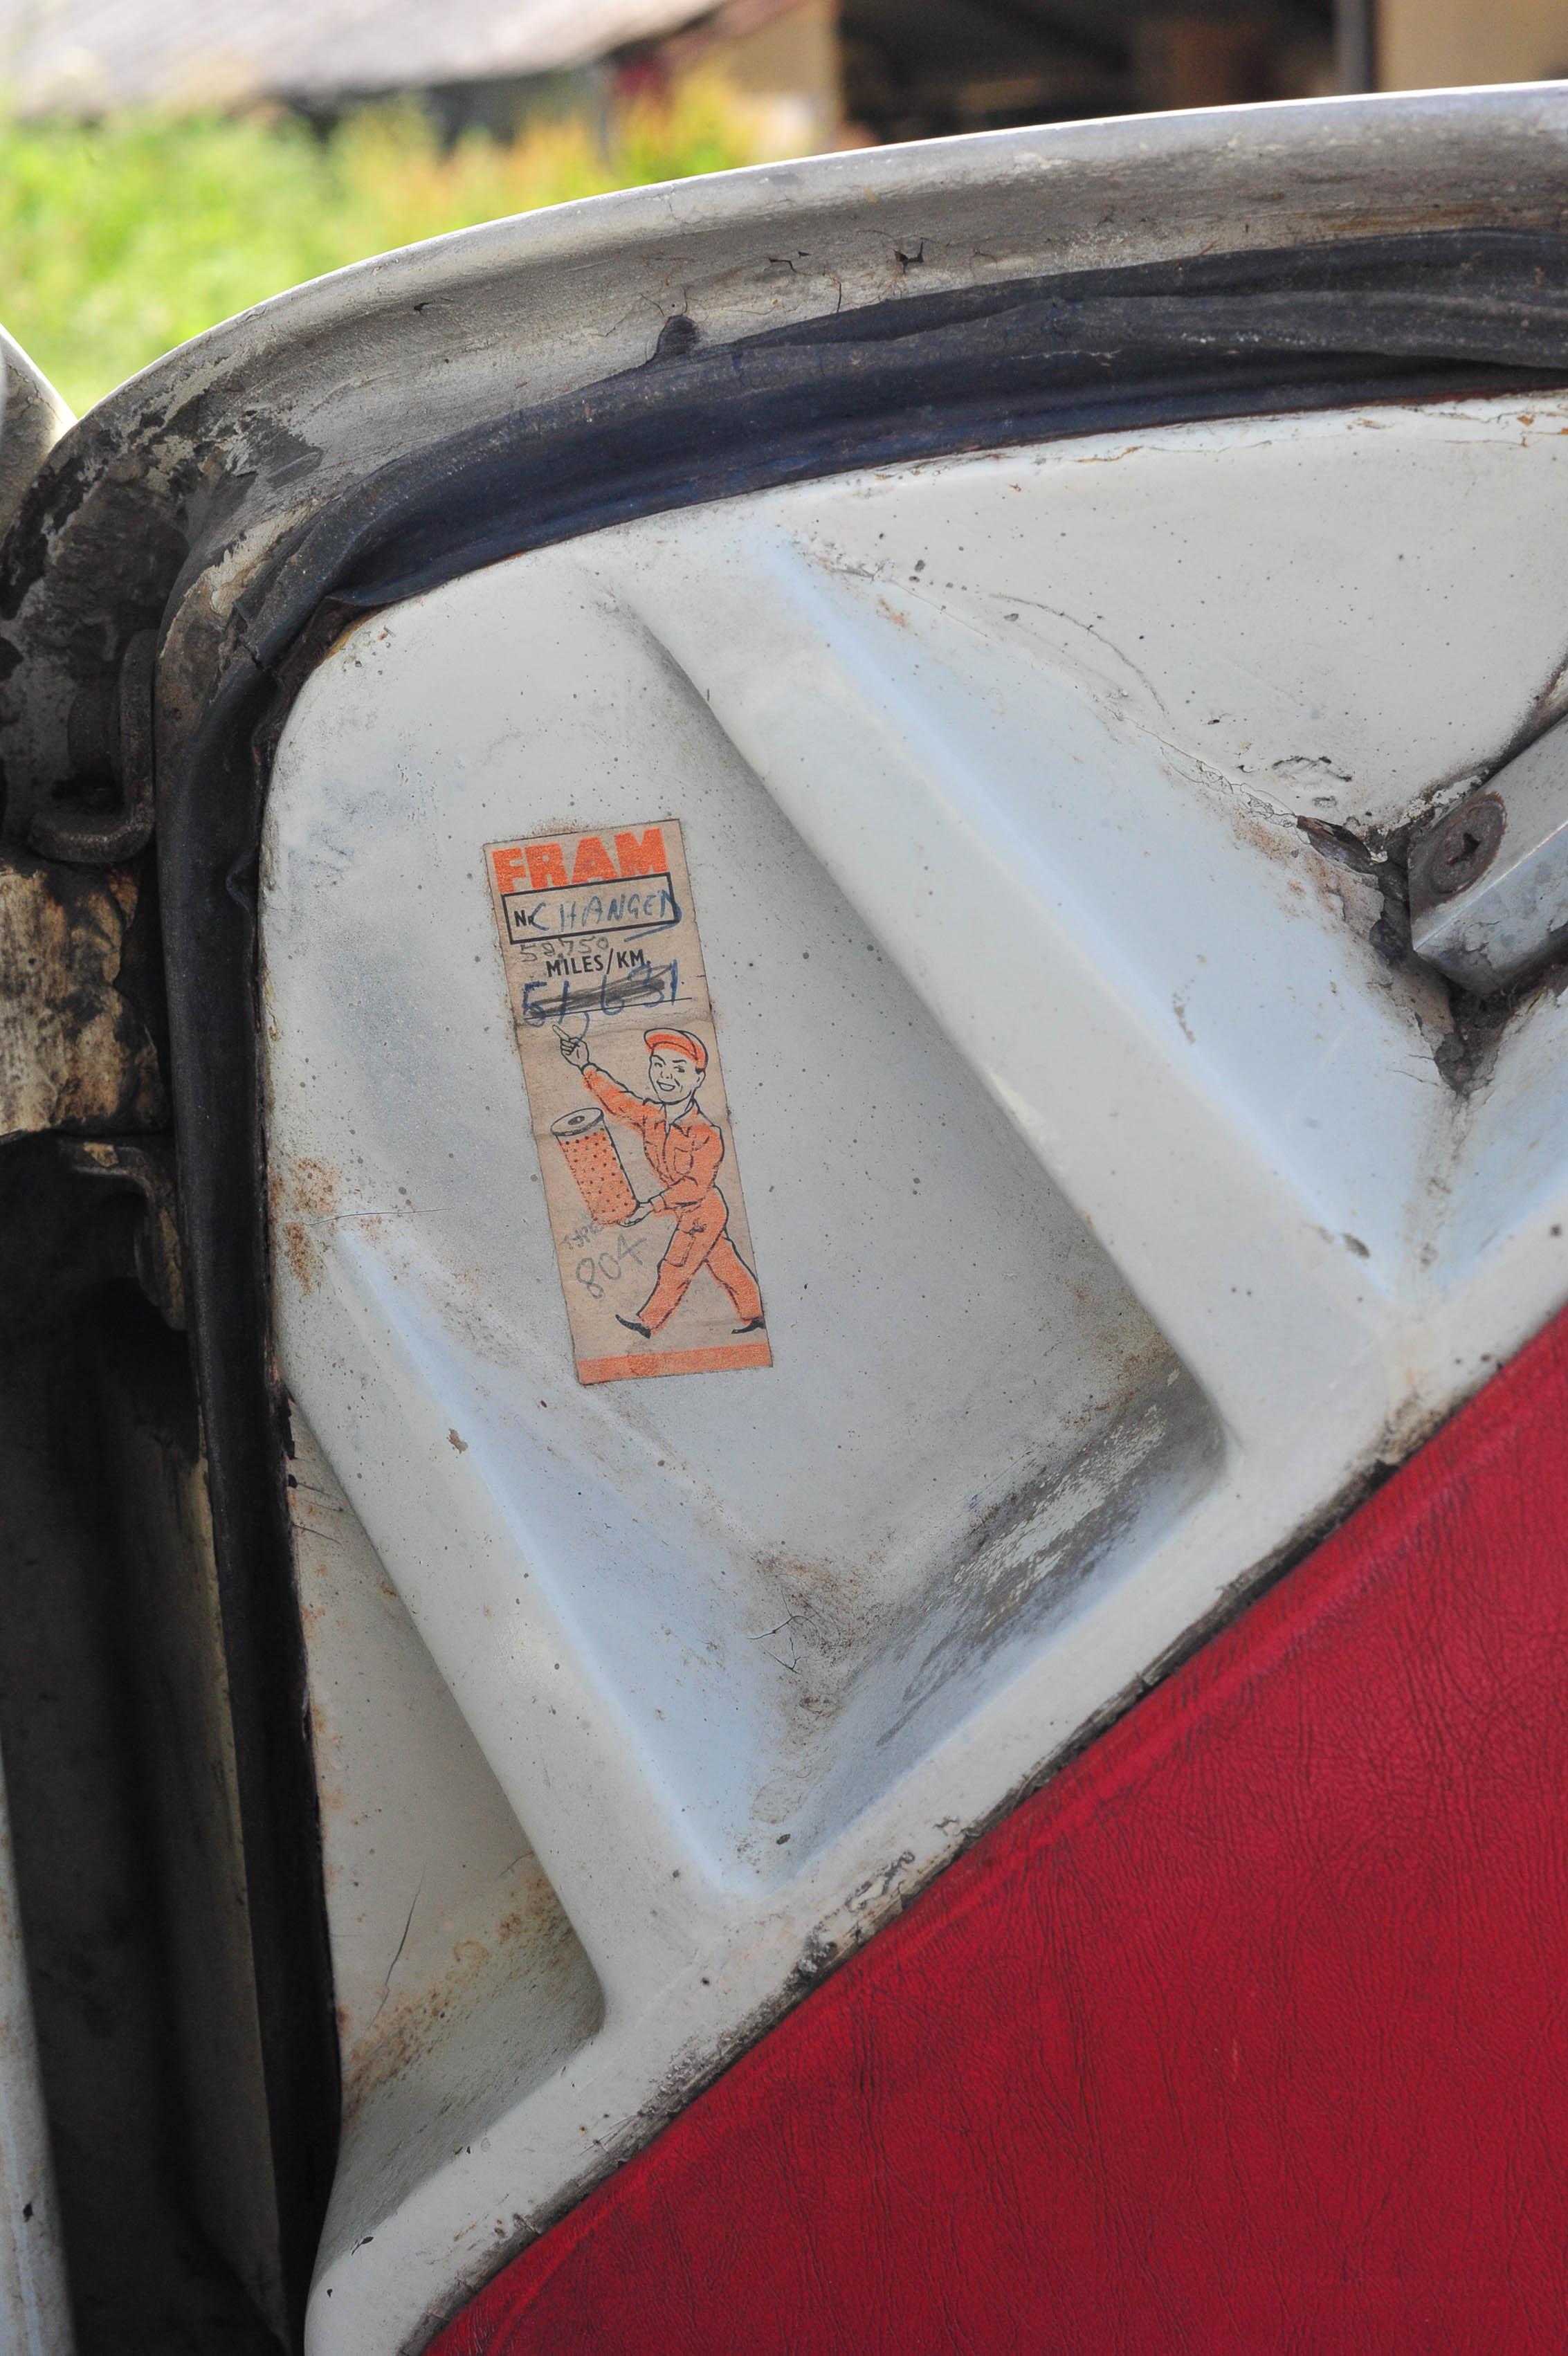 1961 Type 14 Lotus Elite oil change sticker